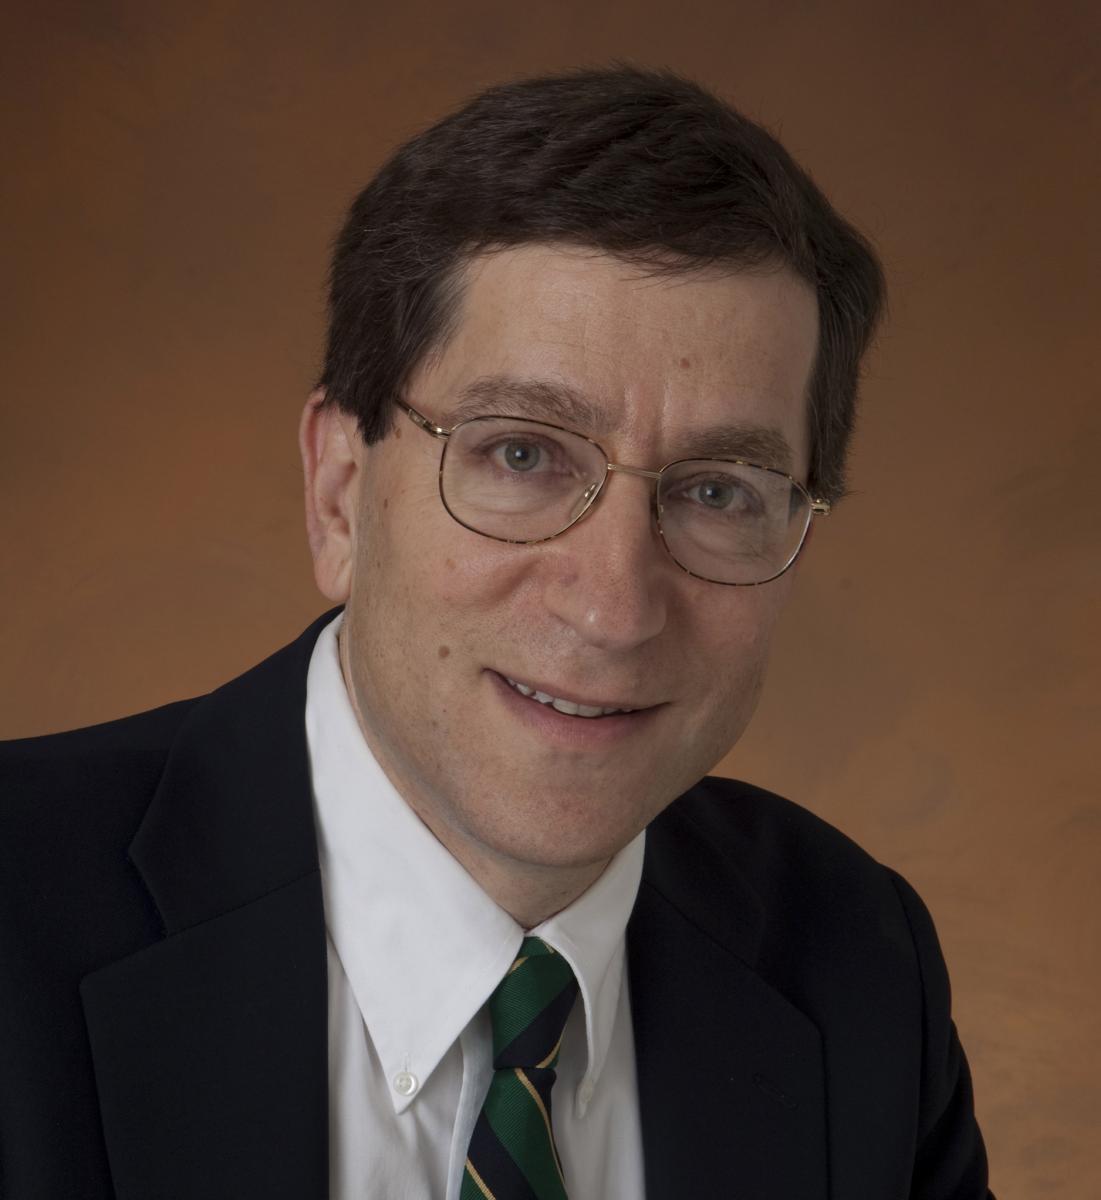 Stephen M. Lichten, Ph.D. Inventor of GPS Navigation Technology